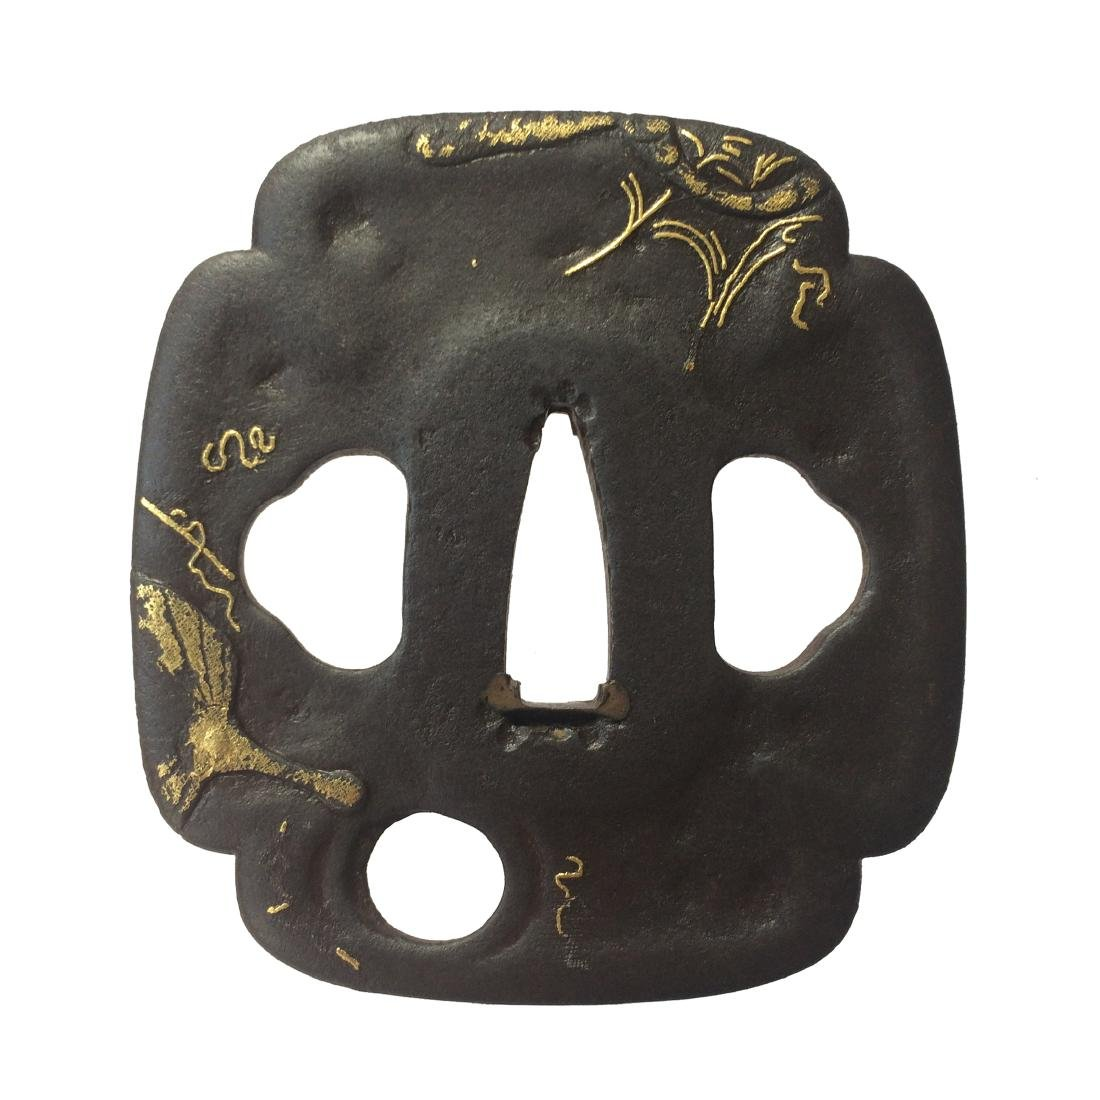 Kumagai (Edo-Higo) tsuba of iron with shakudo and gold - 5